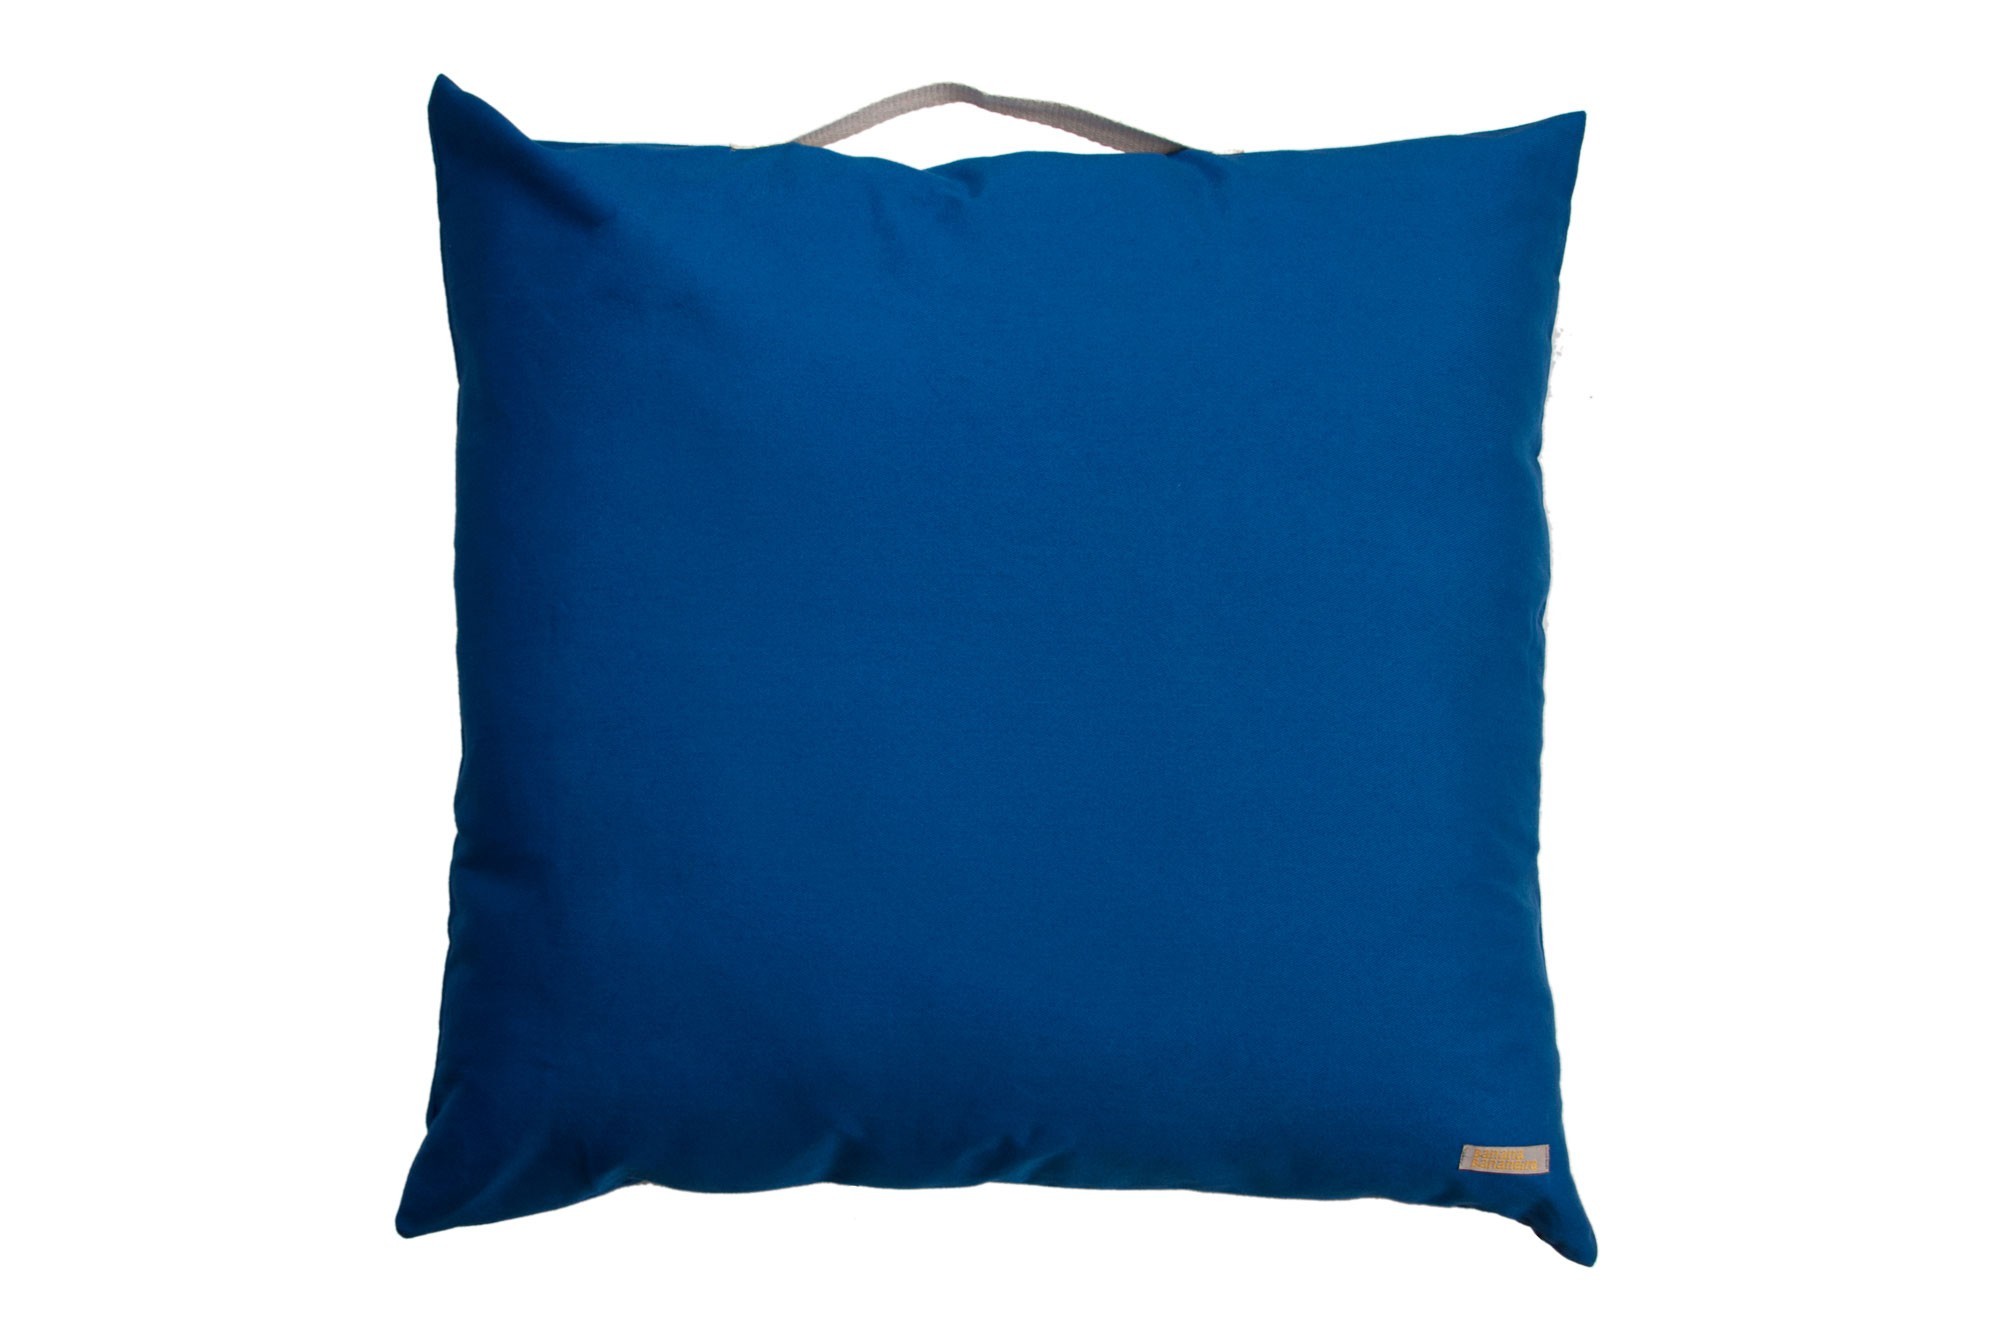 Almofadão pufe azul clássico